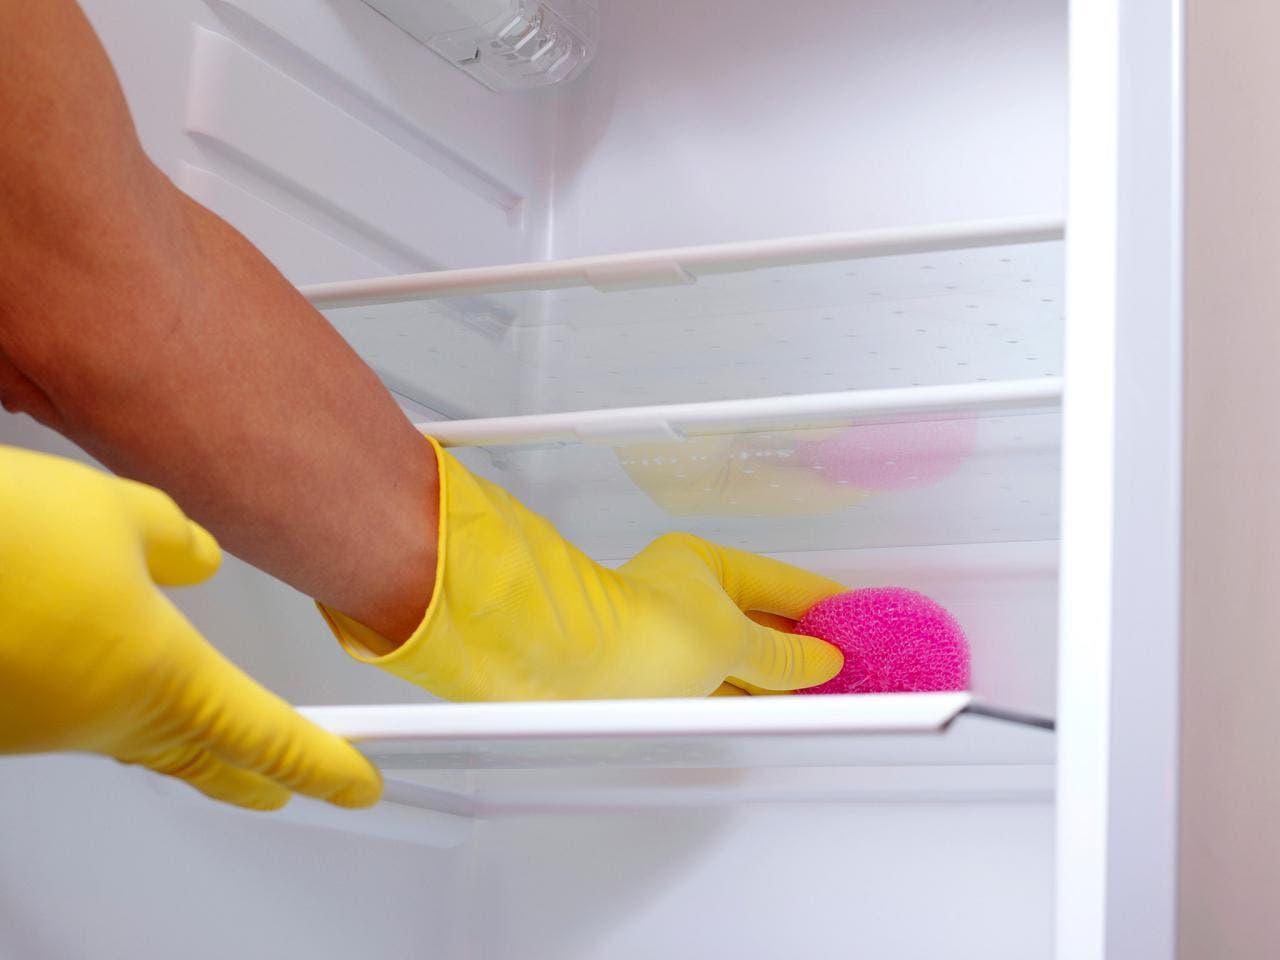 nettoyage refrigerateur1